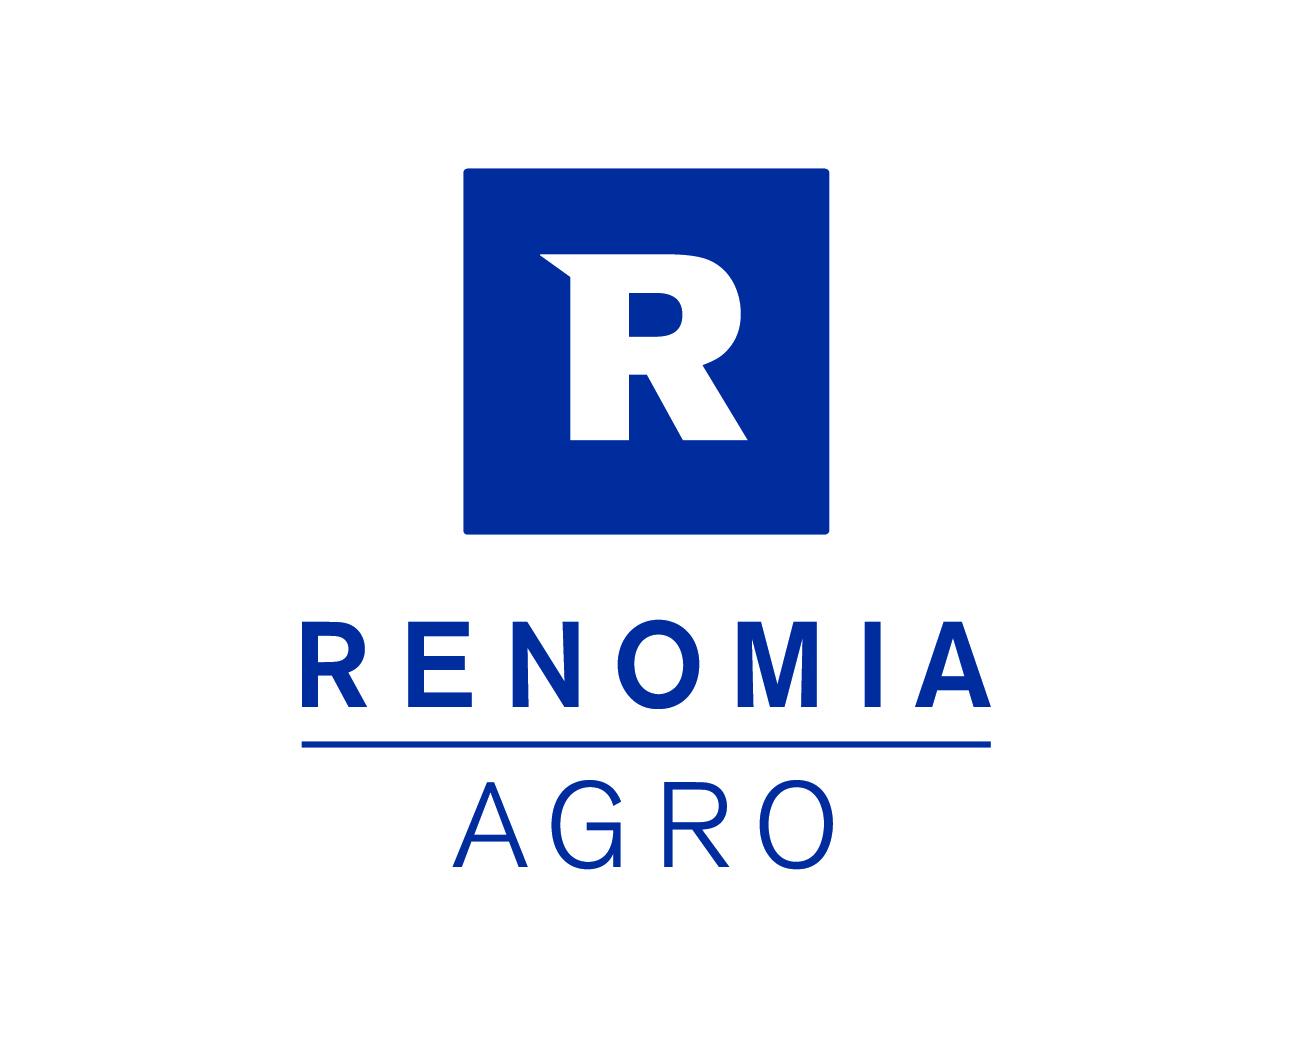 RENOMIA_AGRO_PANTONE